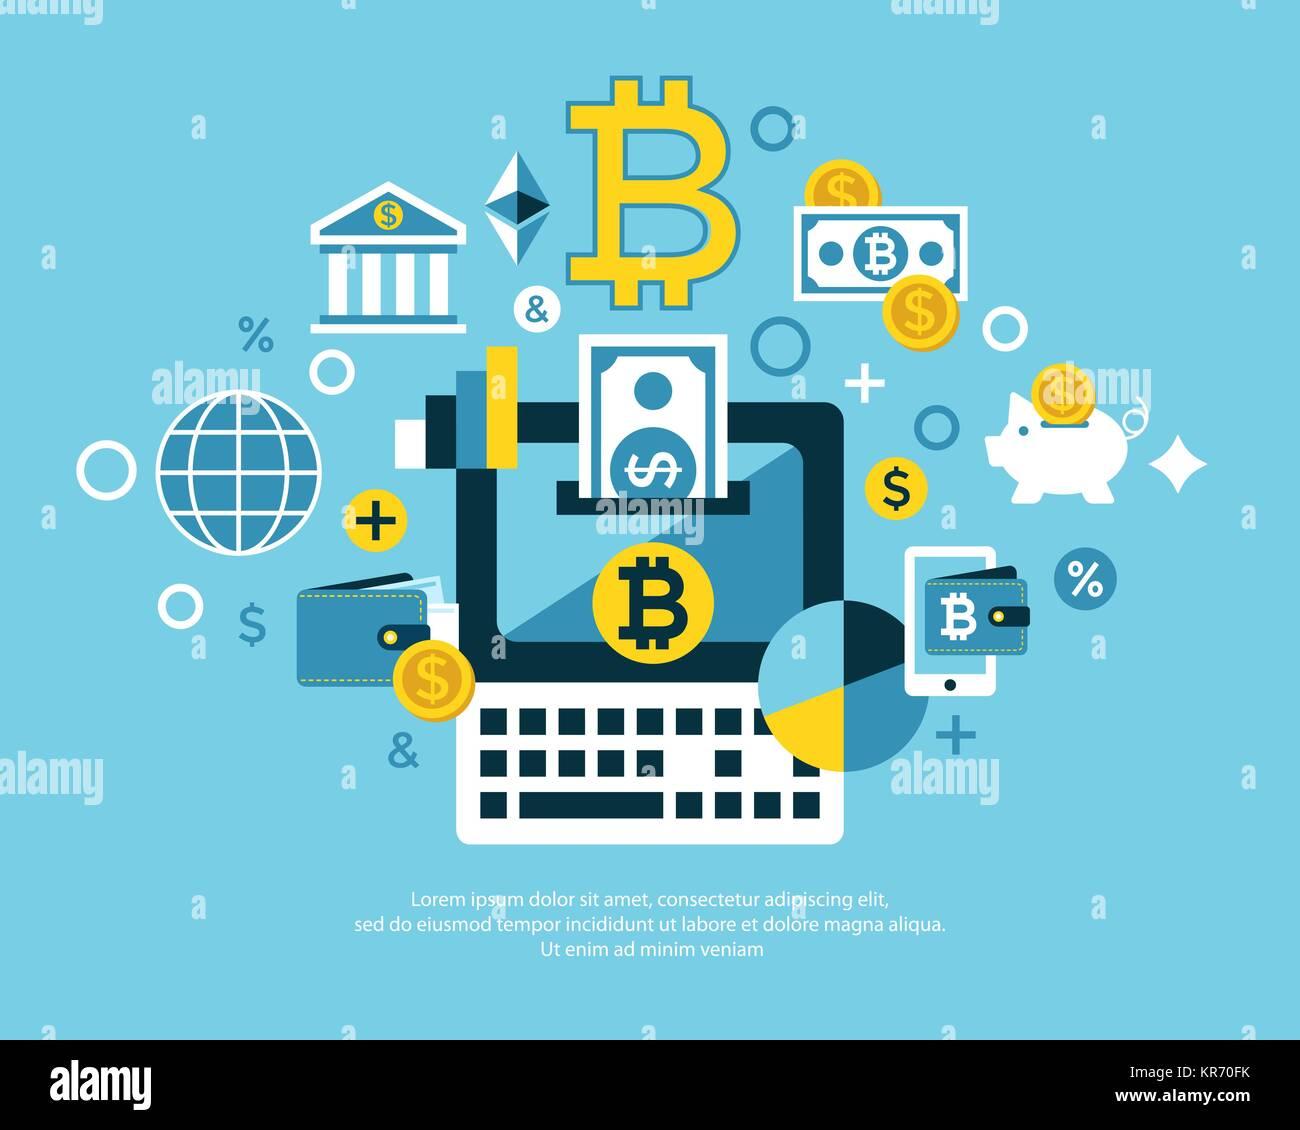 Stocks Related To Bitcoin Online Litecoin Miner – Papelería COPAVISA